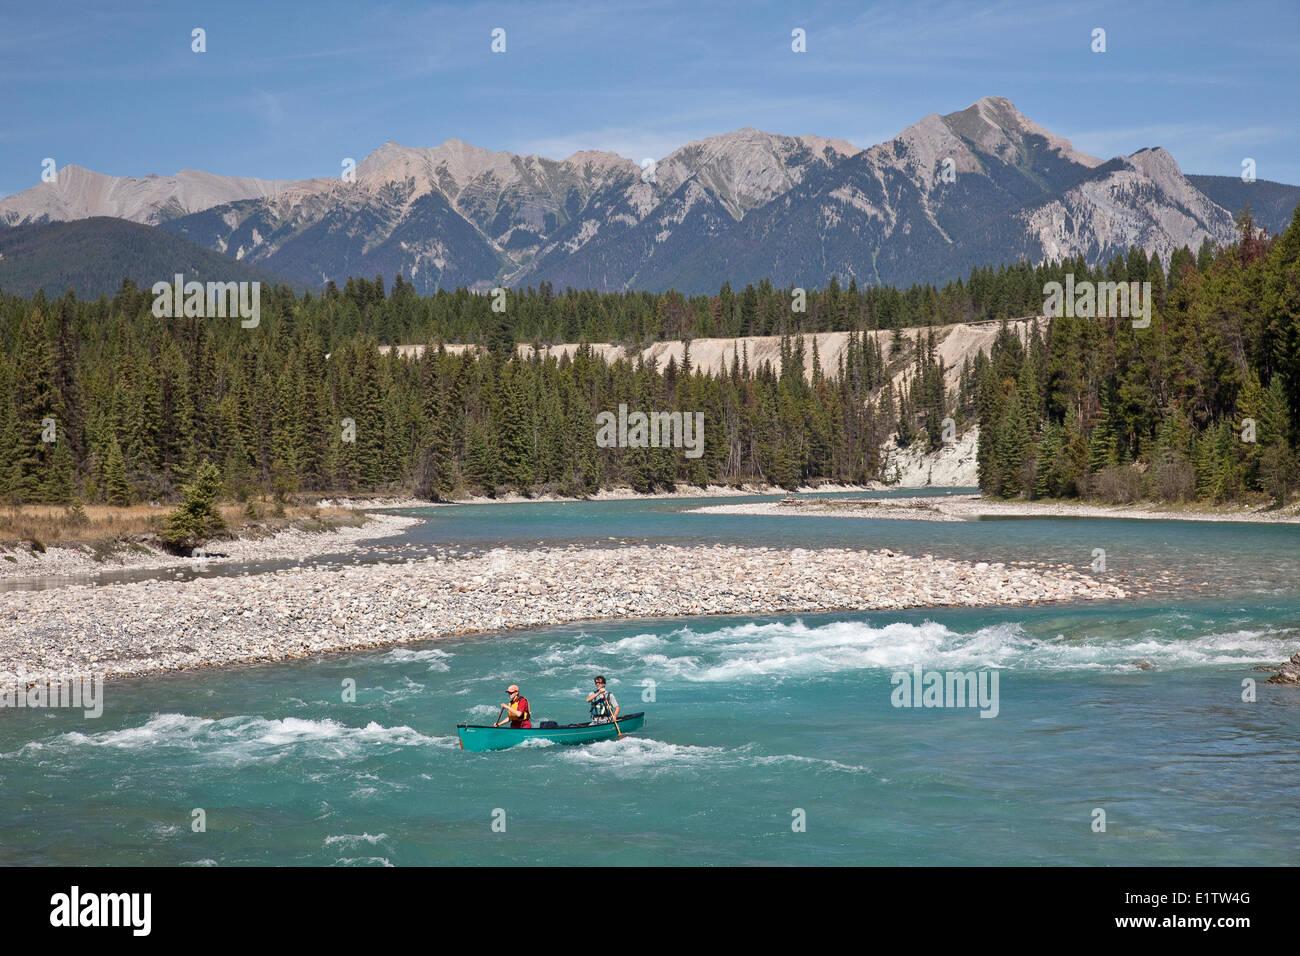 Couple paddle canoe through rapids on Kootenay River, Kootenay National Park, BC, Canada. - Stock Image